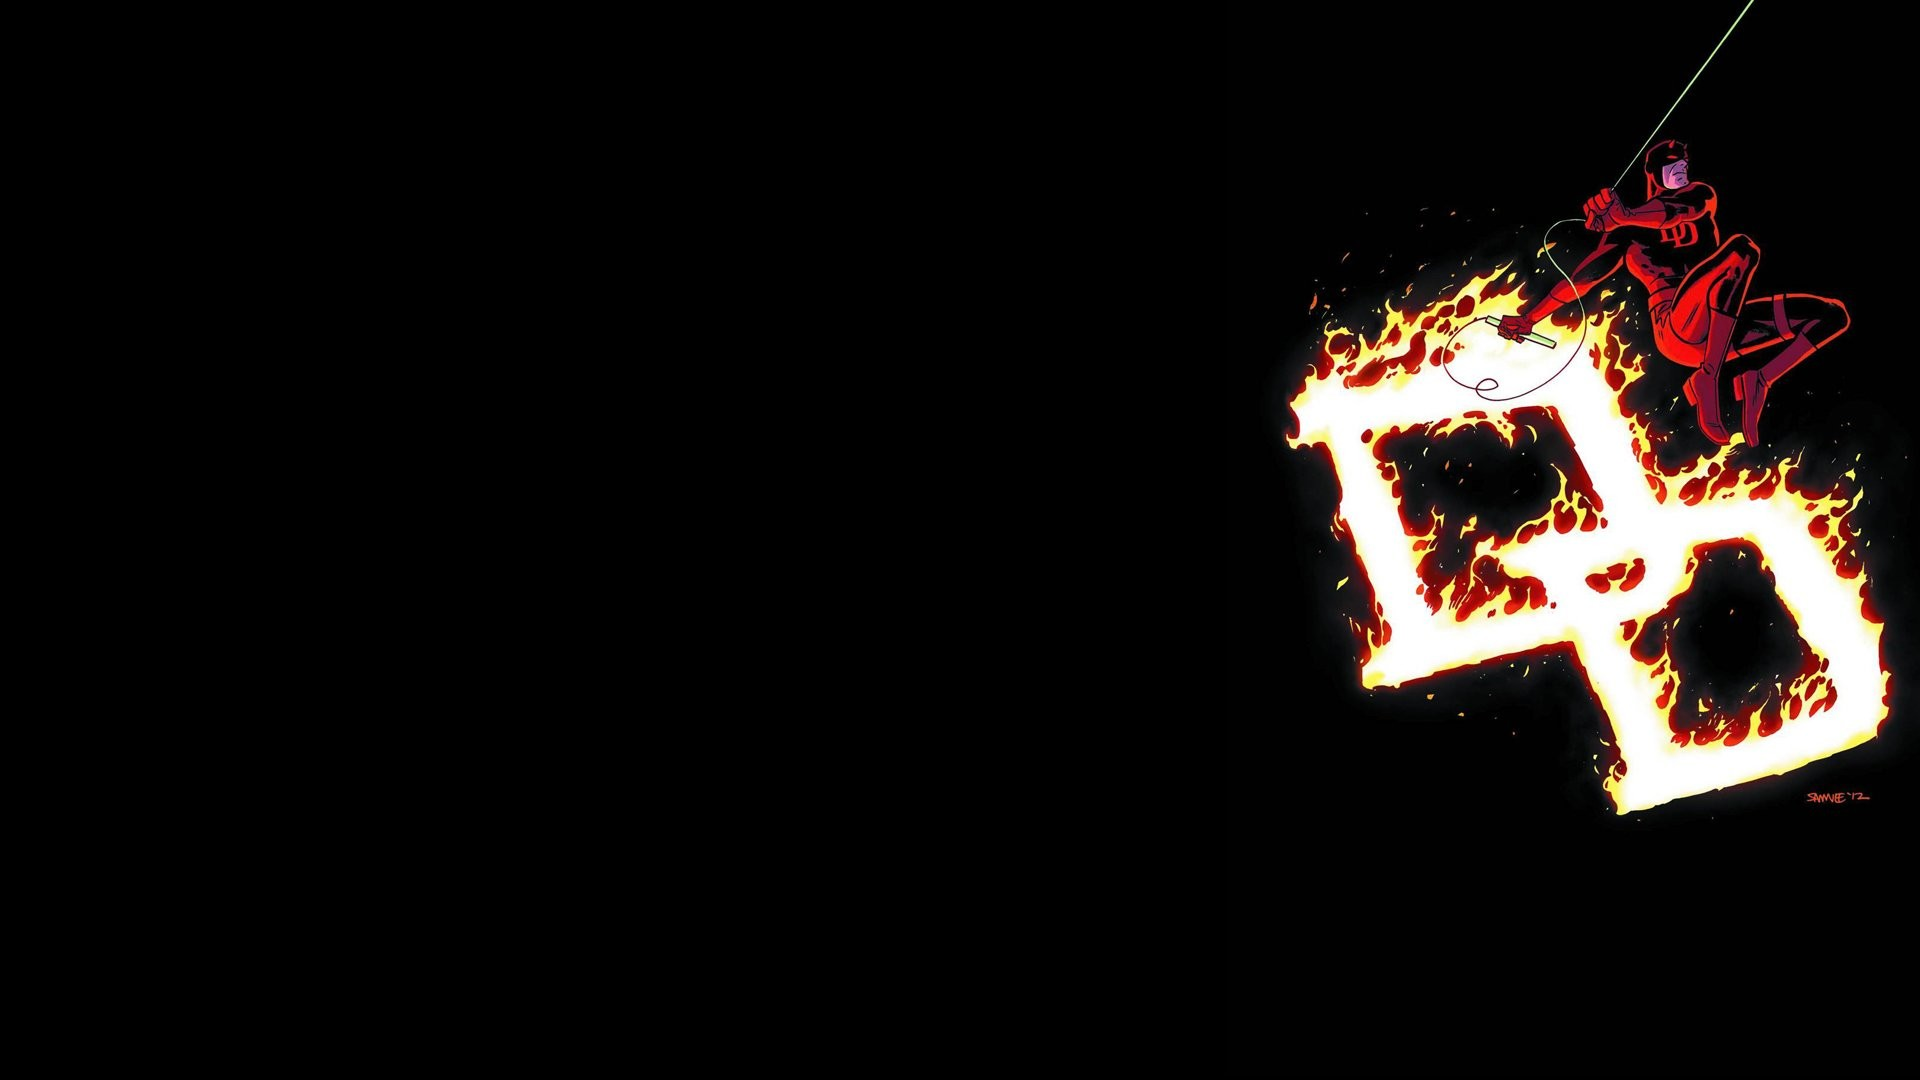 Res: 1920x1080, HD Wallpaper | Background Image ID:470228.  Comics Daredevil